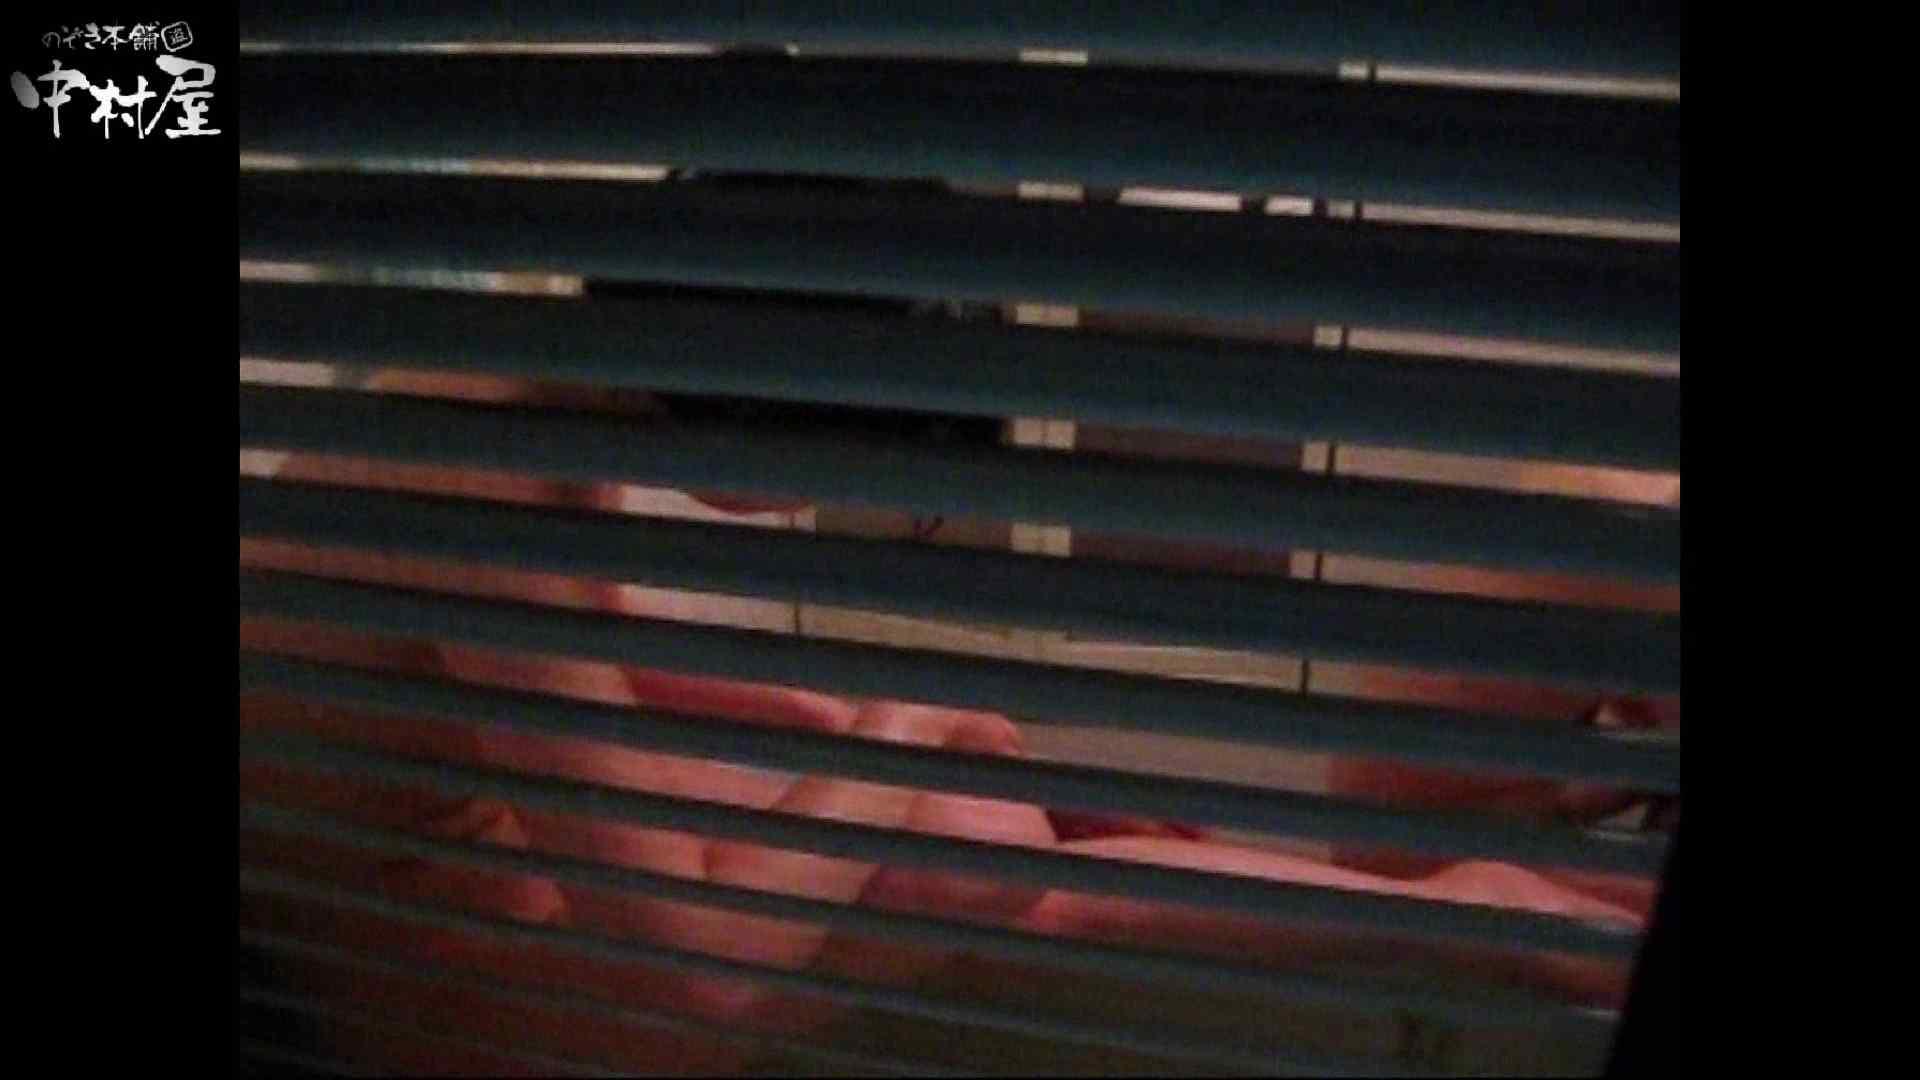 民家風呂専門盗撮師の超危険映像 vol.007 股間 | OLのエロ生活  103連発 43